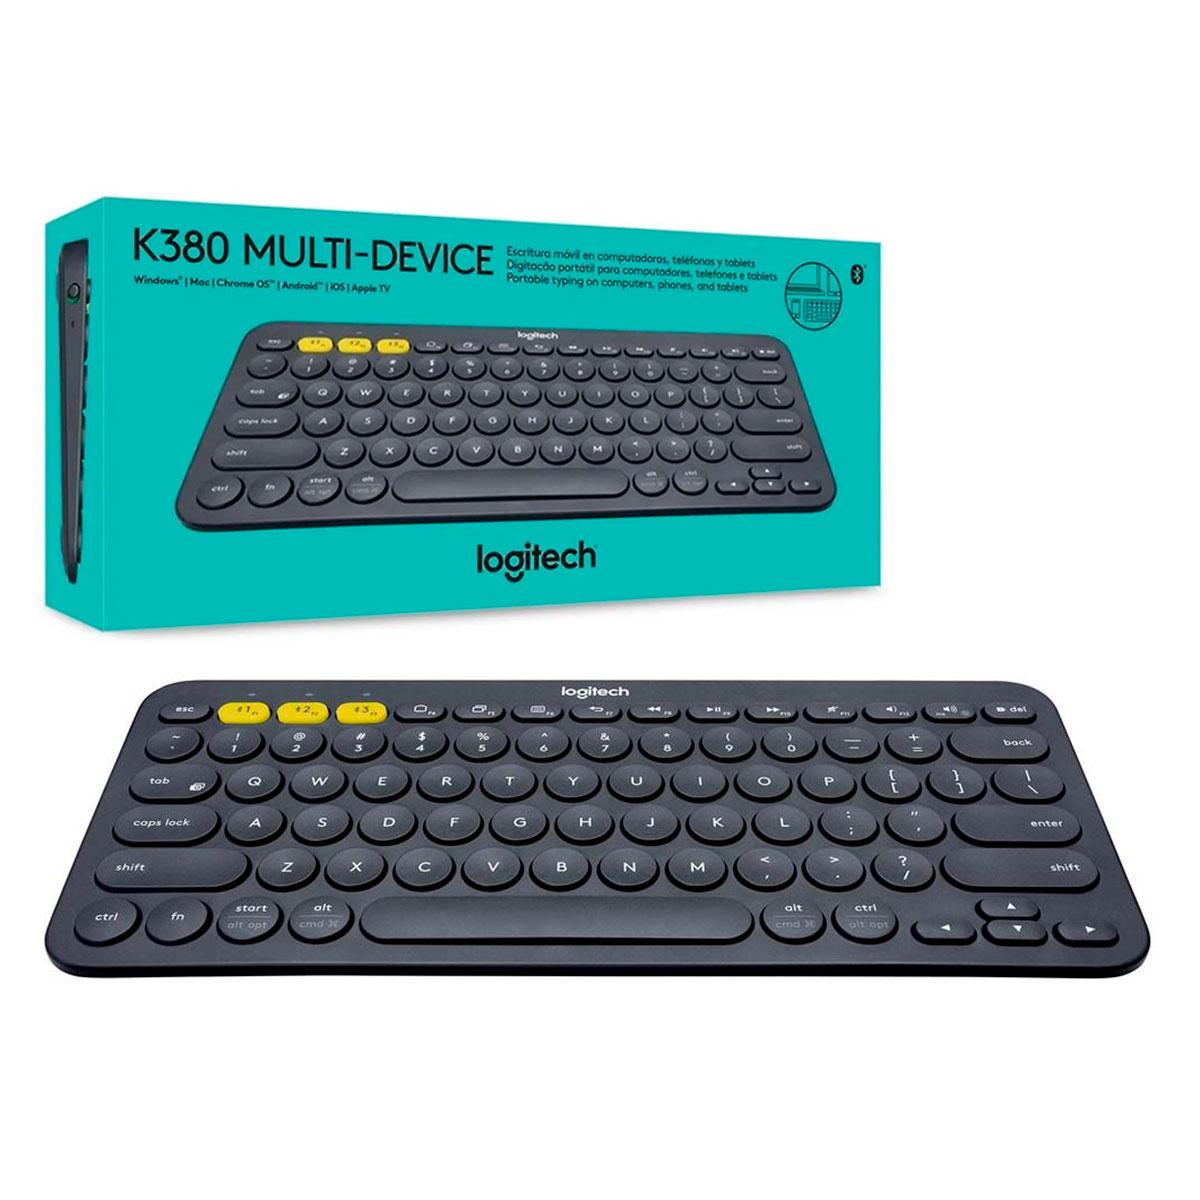 Teclado Logitech K380 Multi-Device, Bluetooth, US, Preto - 920-007564